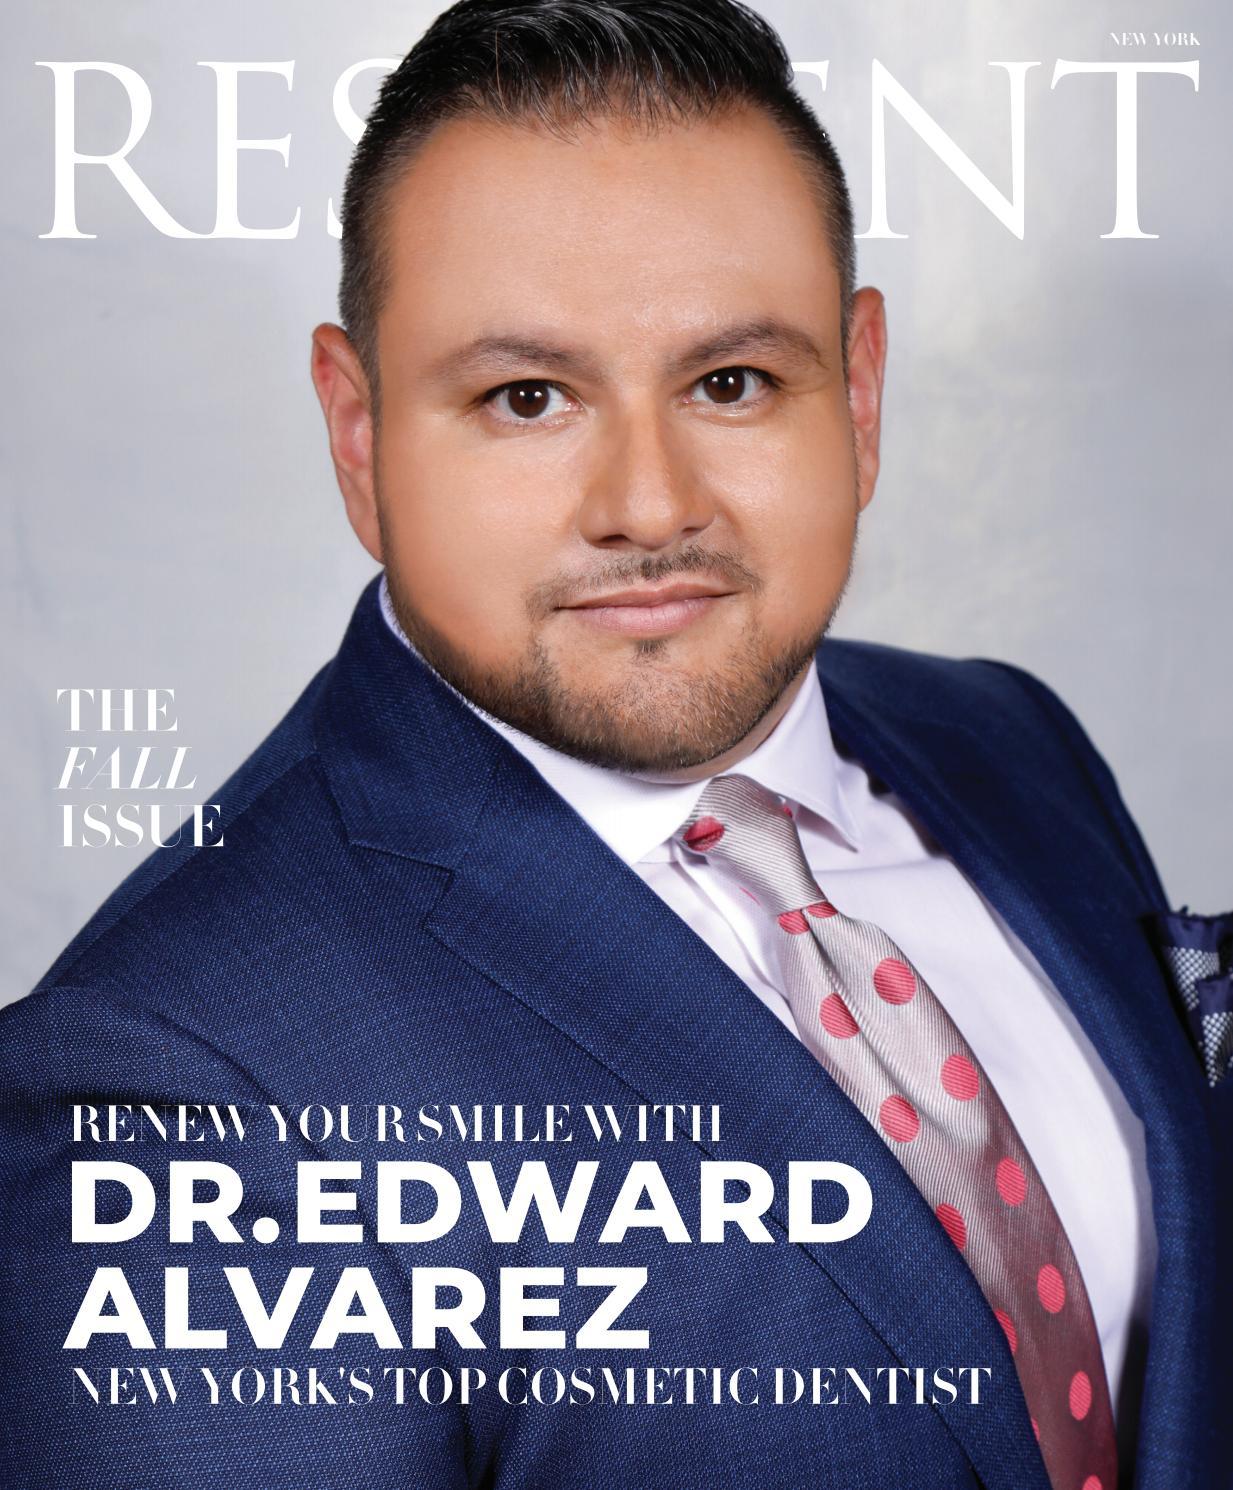 Resident Magazine Ny Edition September 2018 2 By Resident